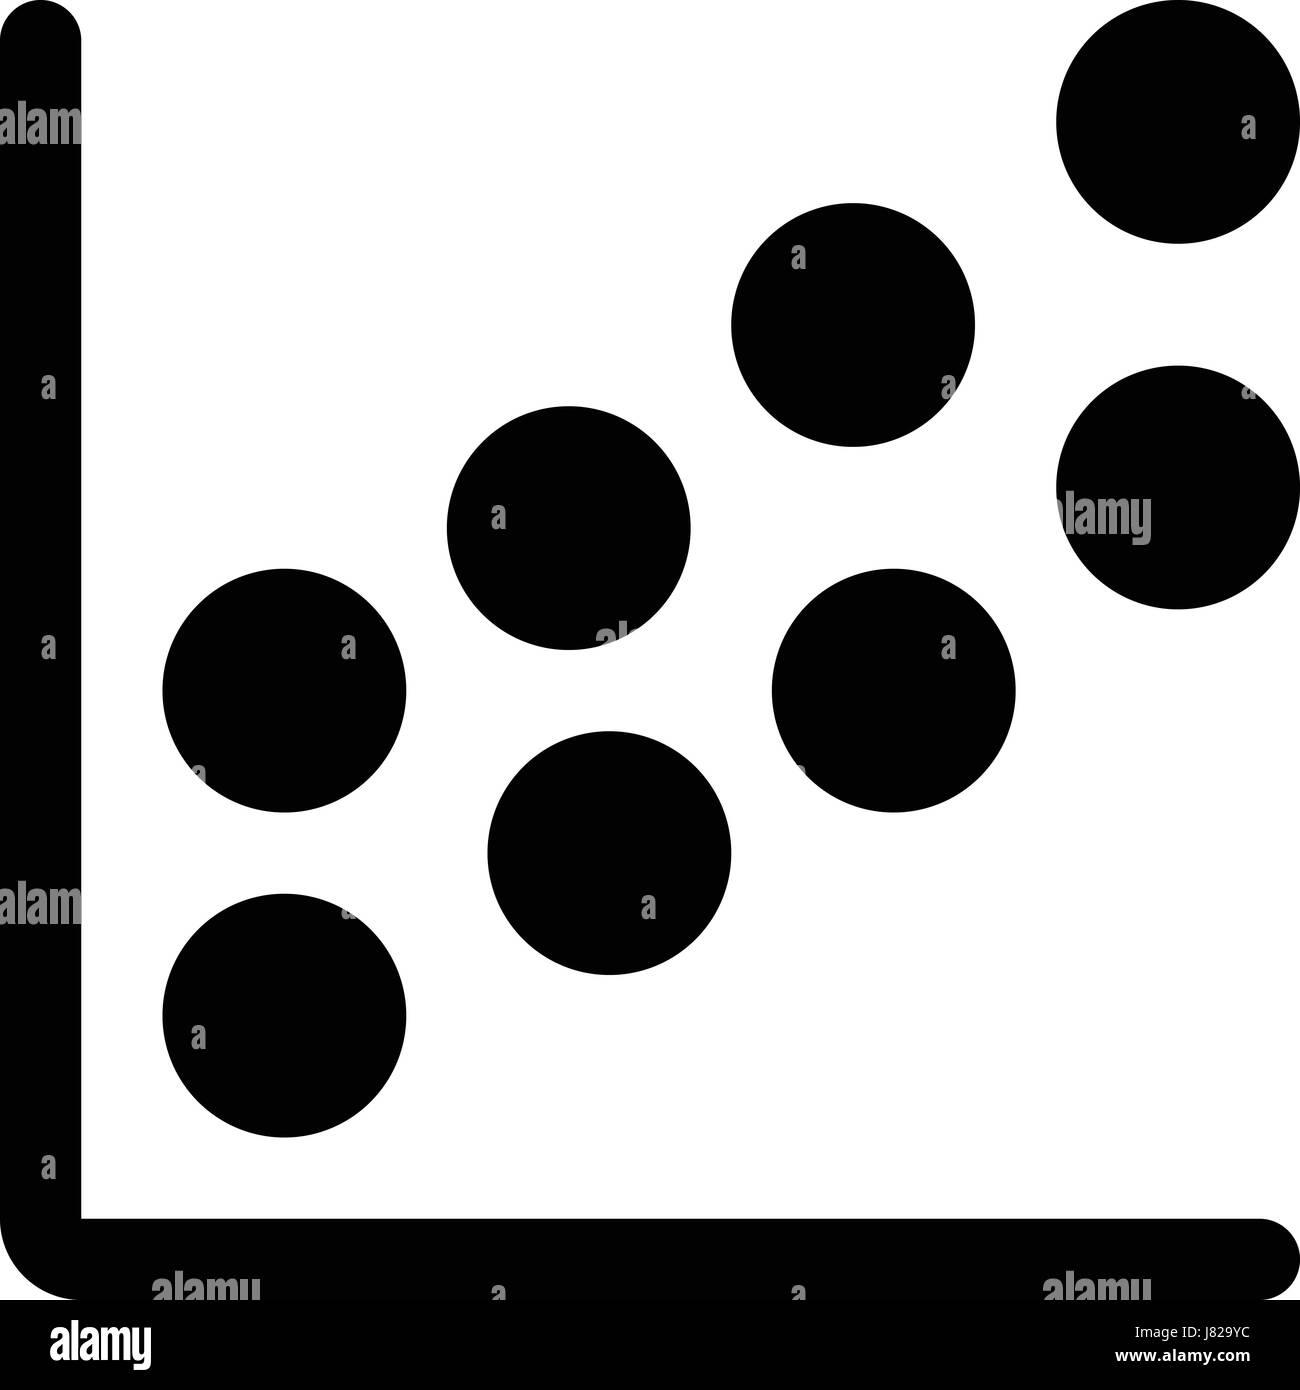 bubble chart - Stock Image